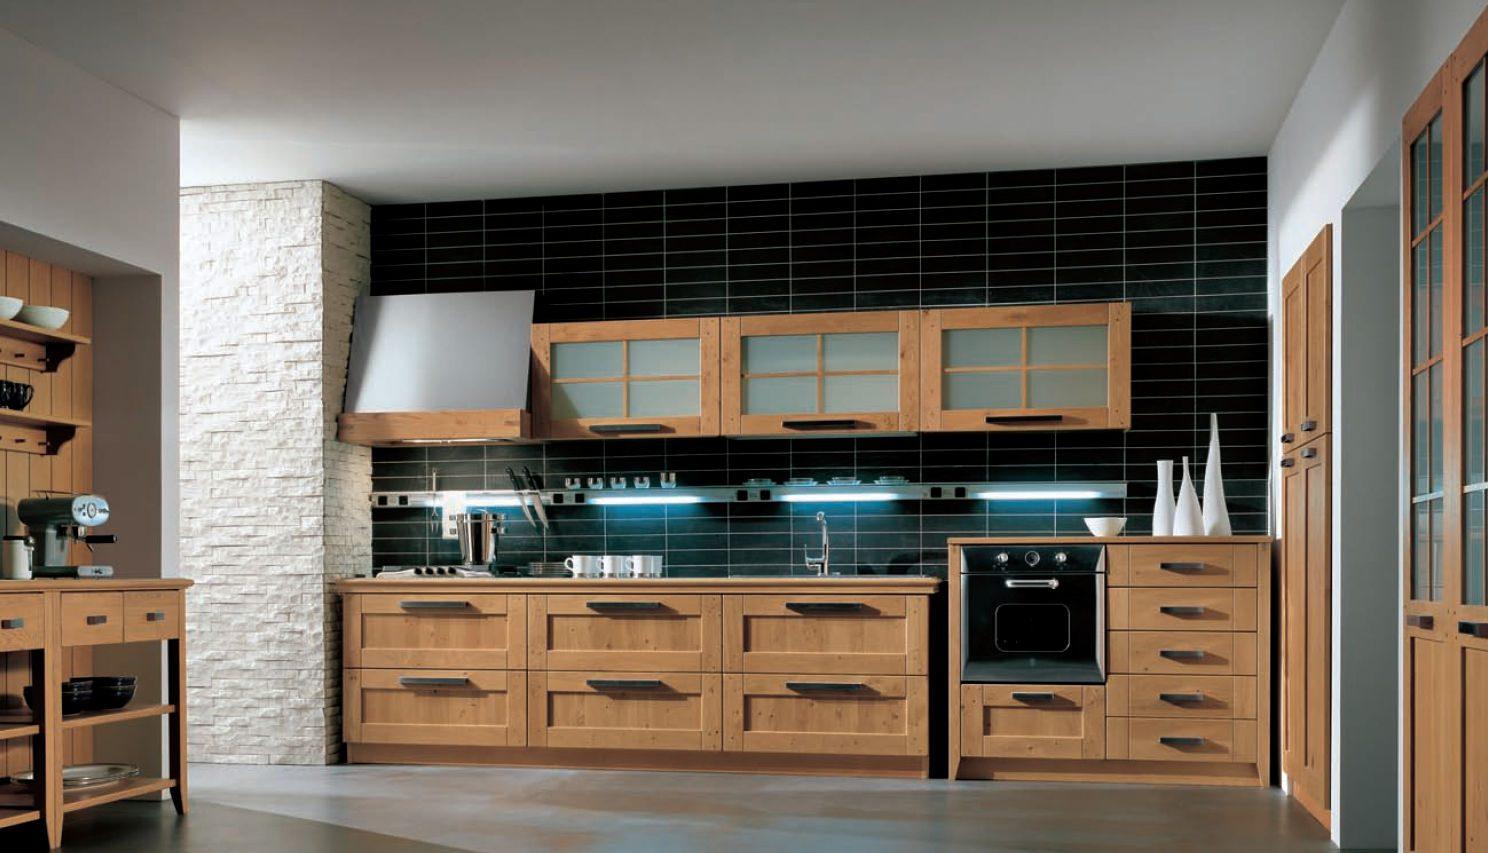 Puertas de madera - Puertas para cocina | Agloma